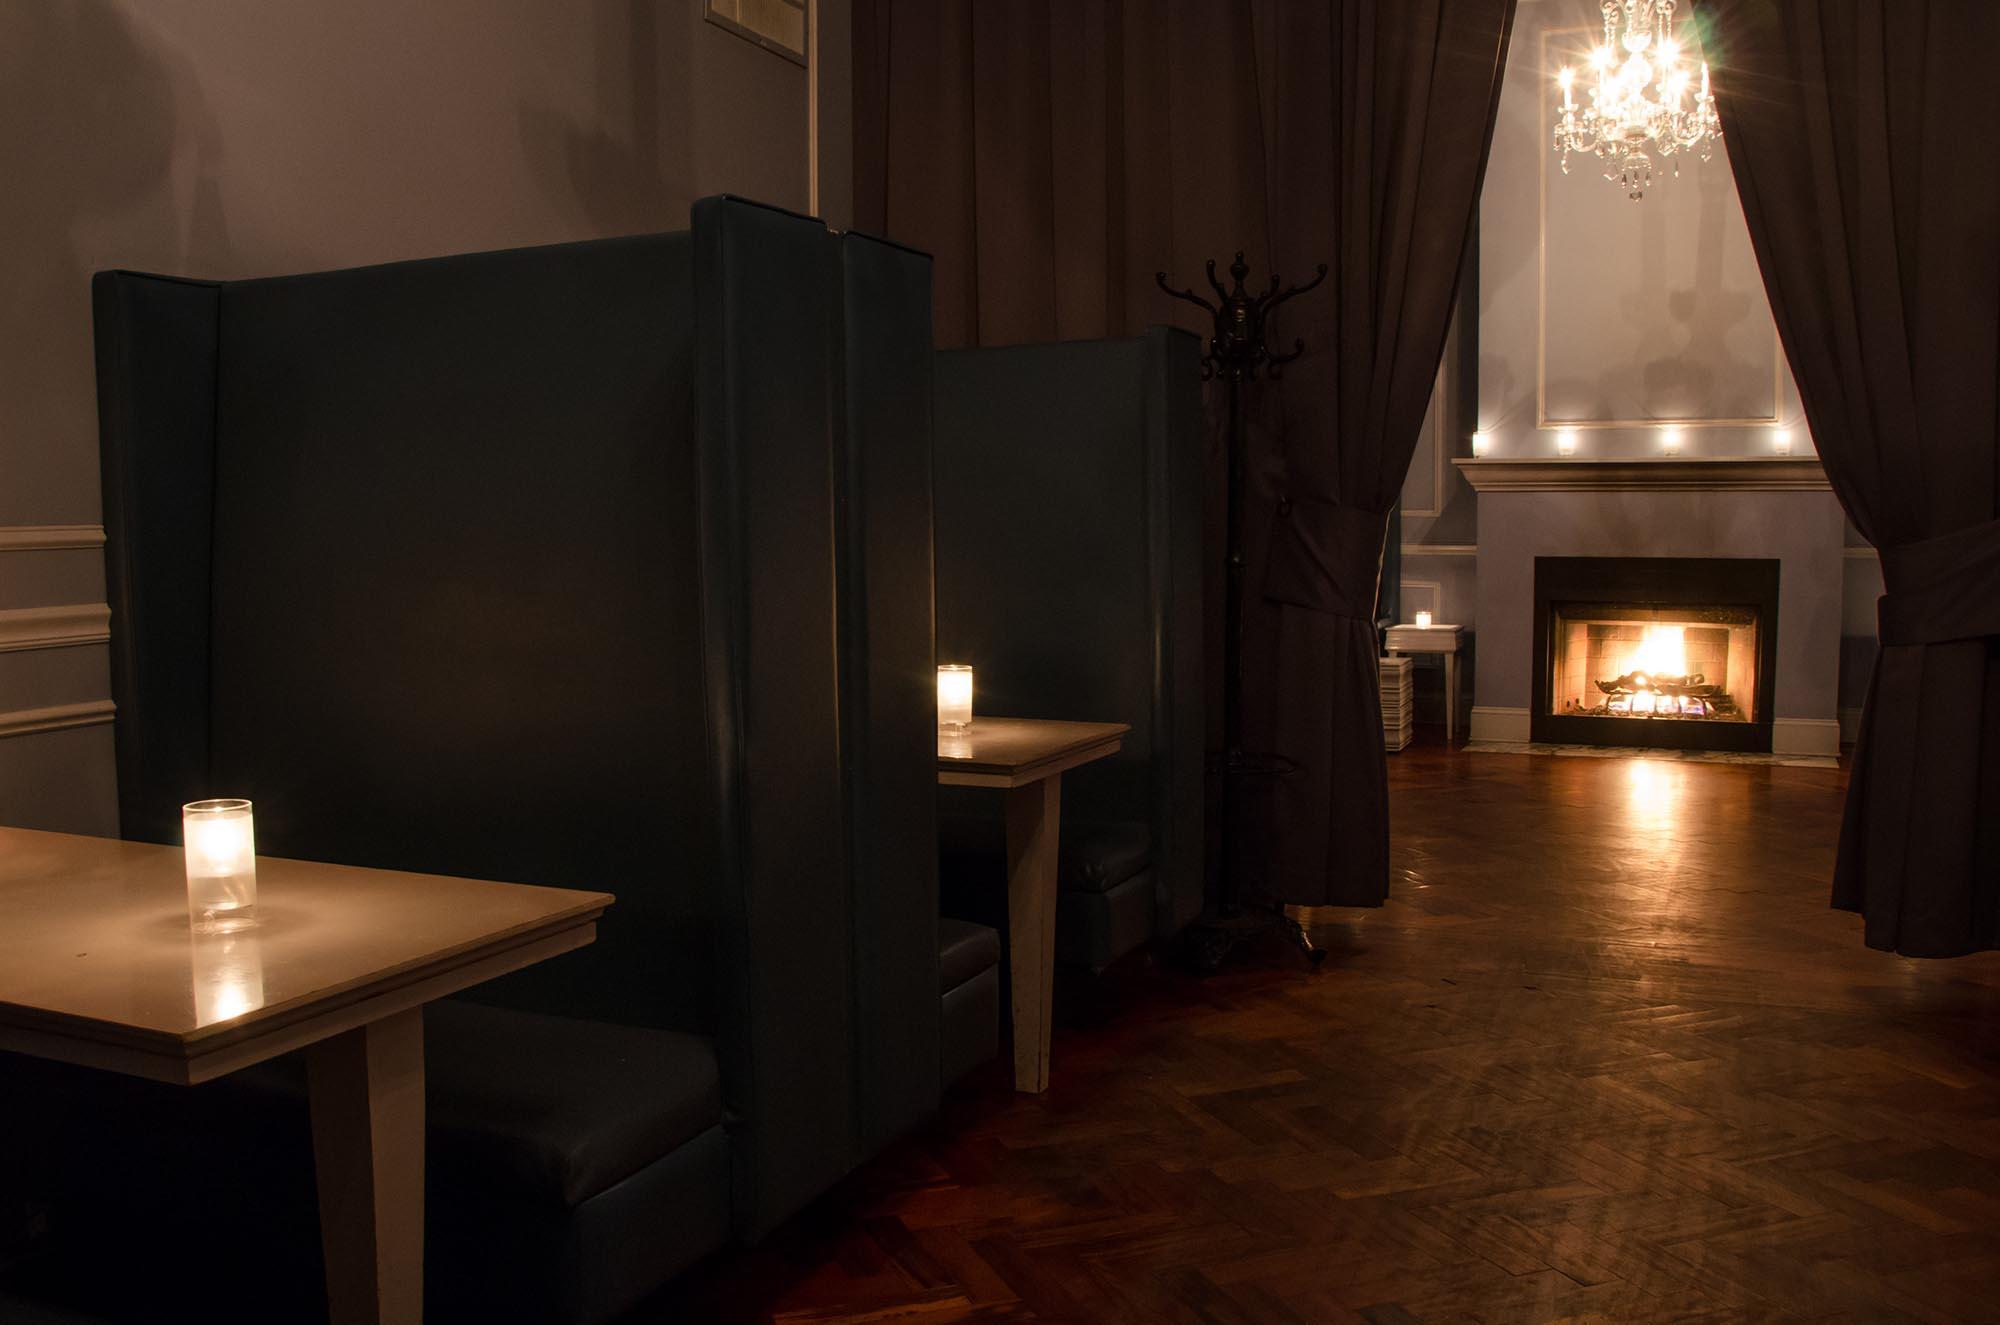 Fireplace-Joni Kat Anderson.jpg